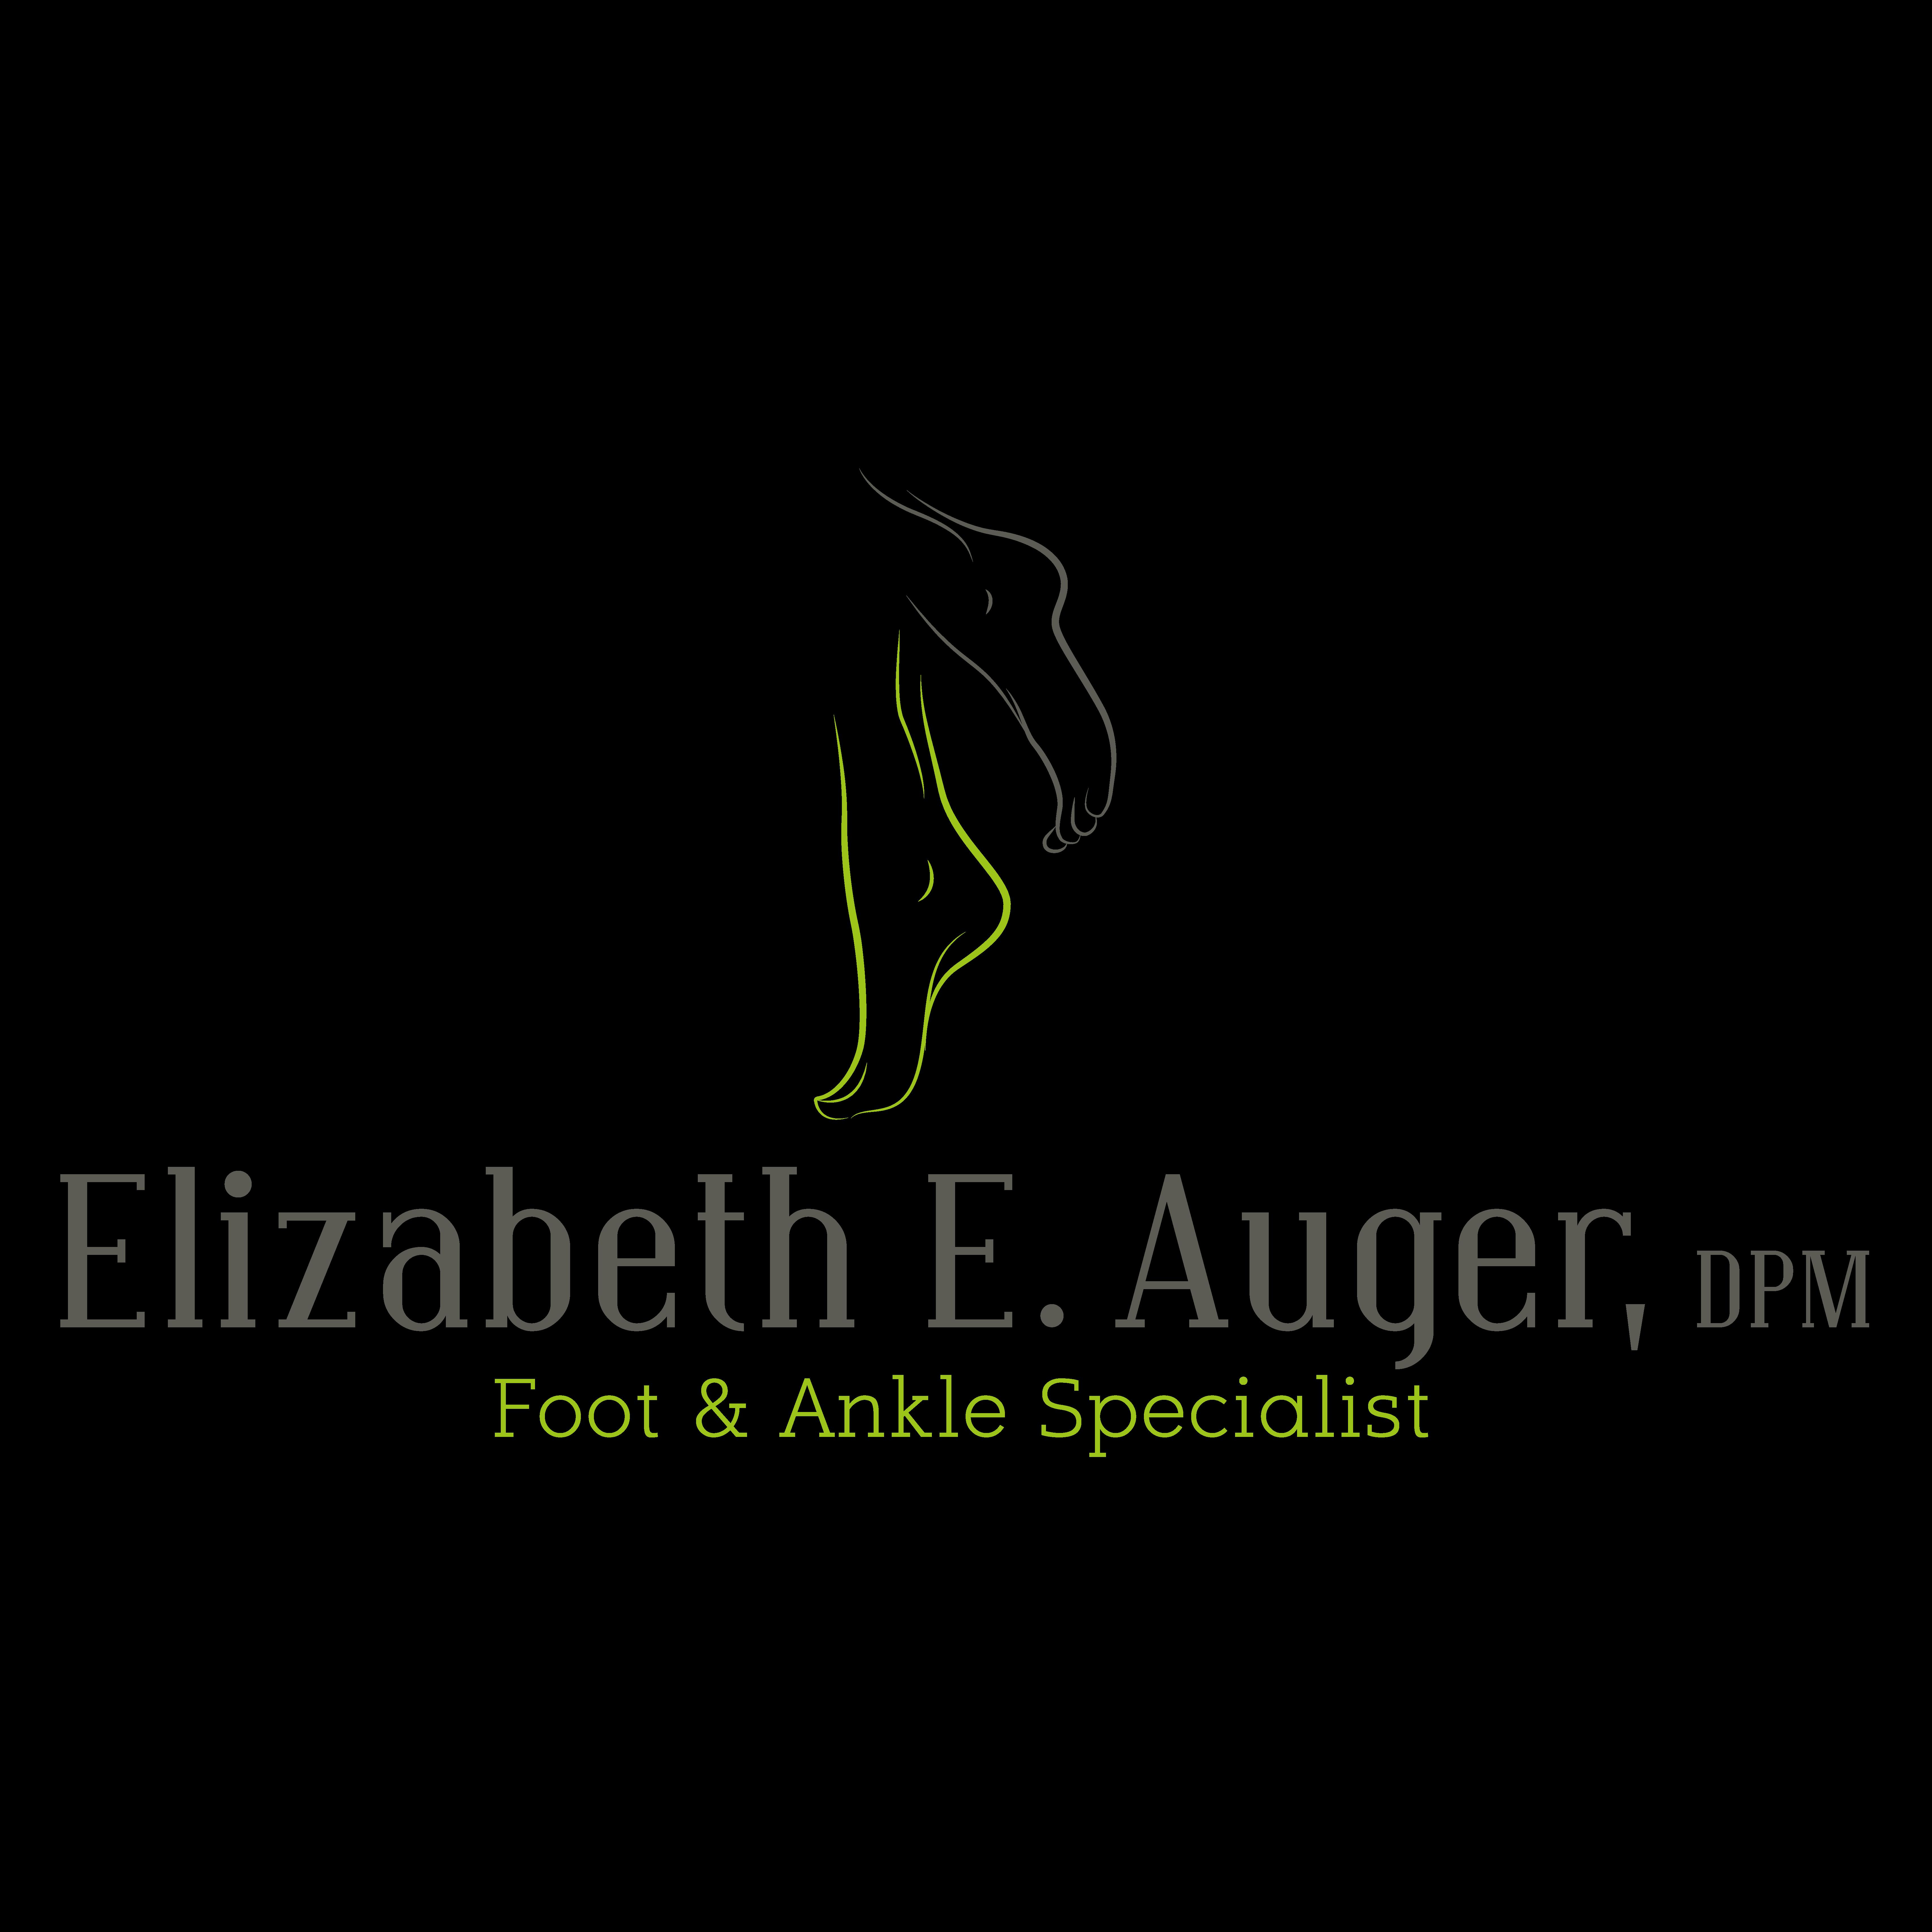 Elizabeth E. Auger, DPM - Sandy, UT - Podiatry